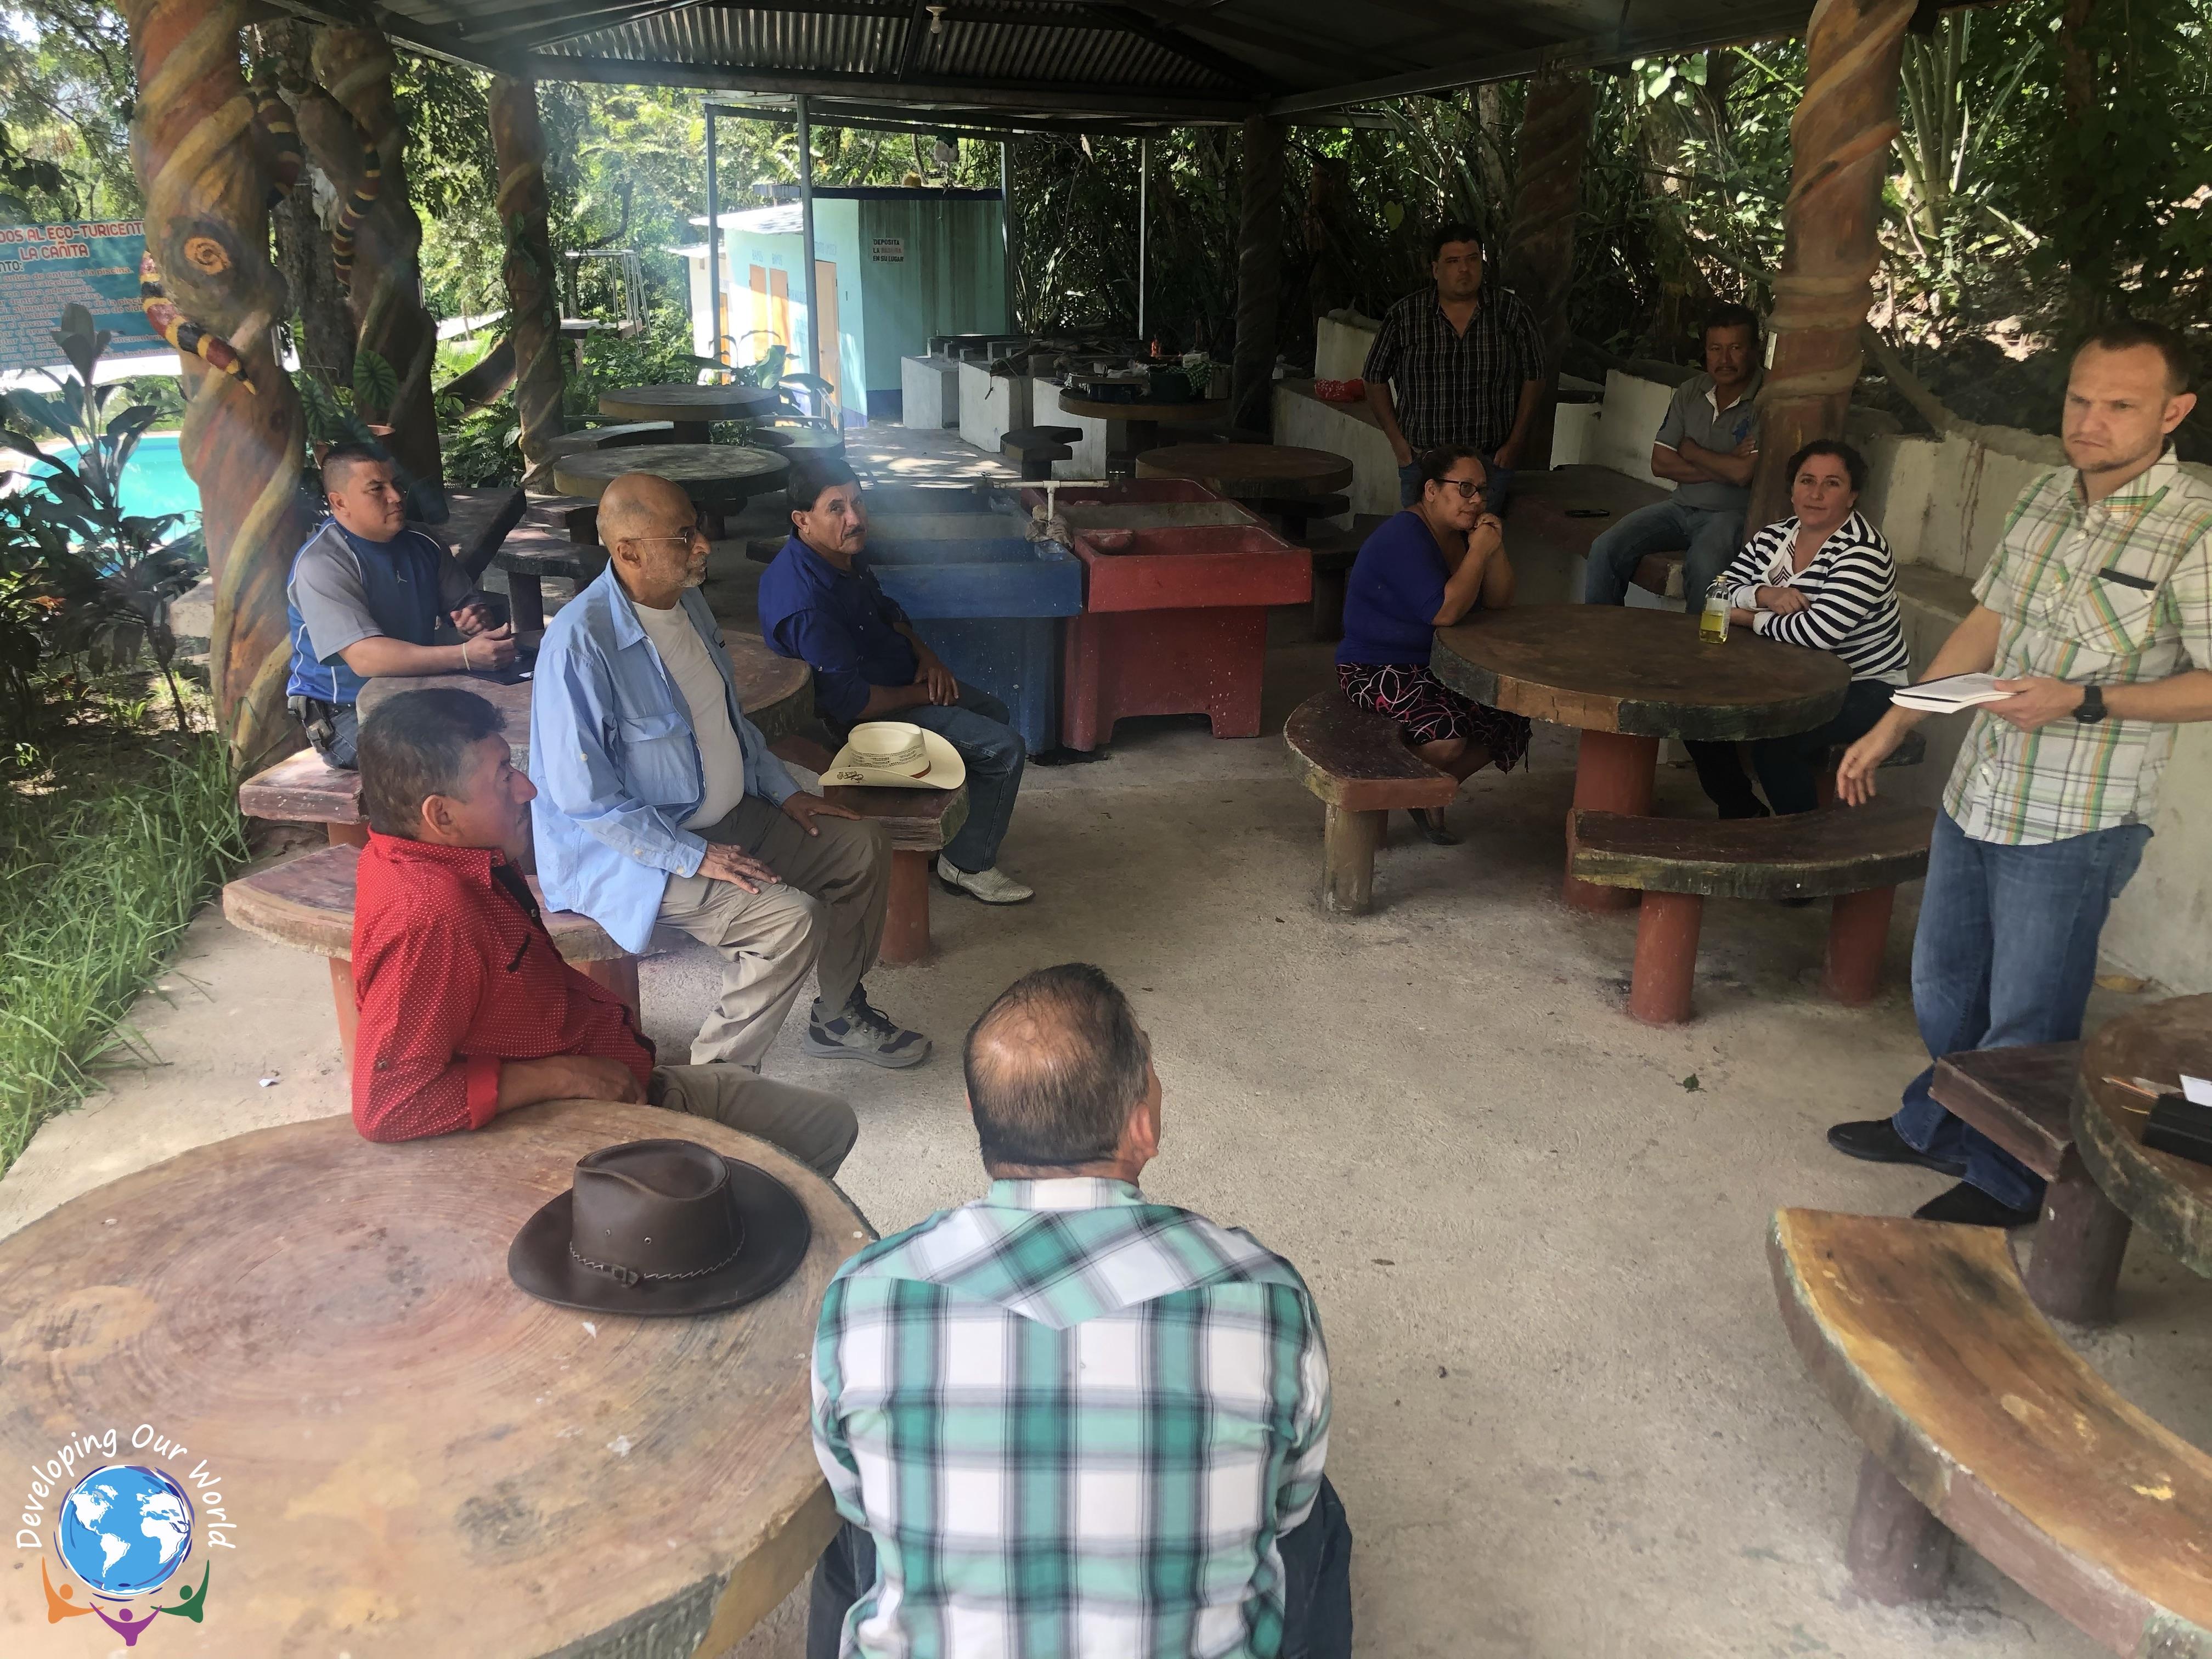 Training Leaders in Guatemala